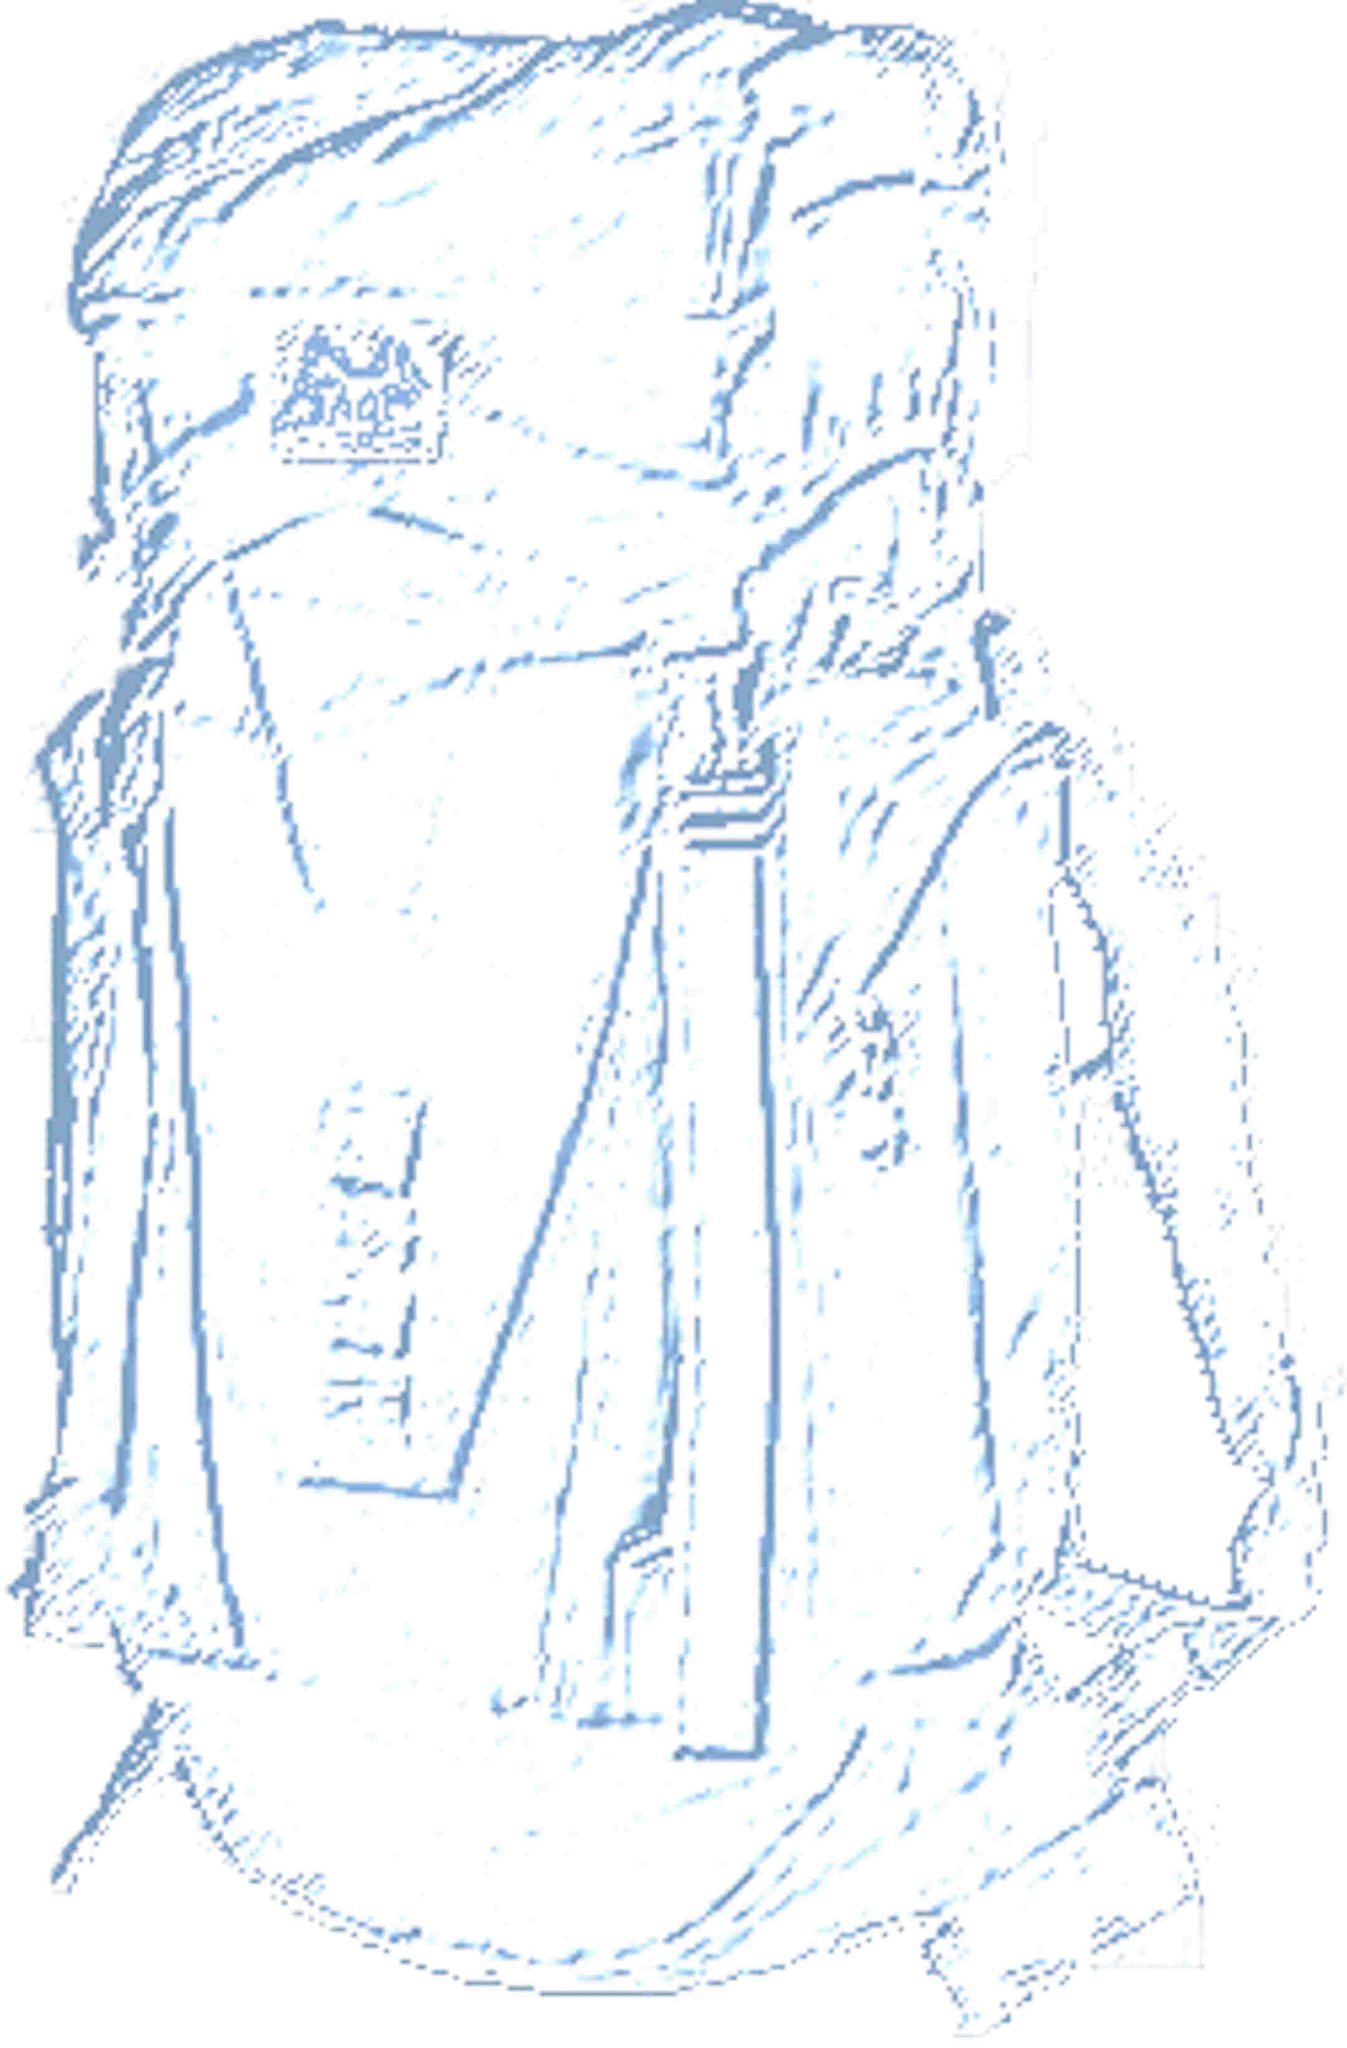 Sherpa's rucksack